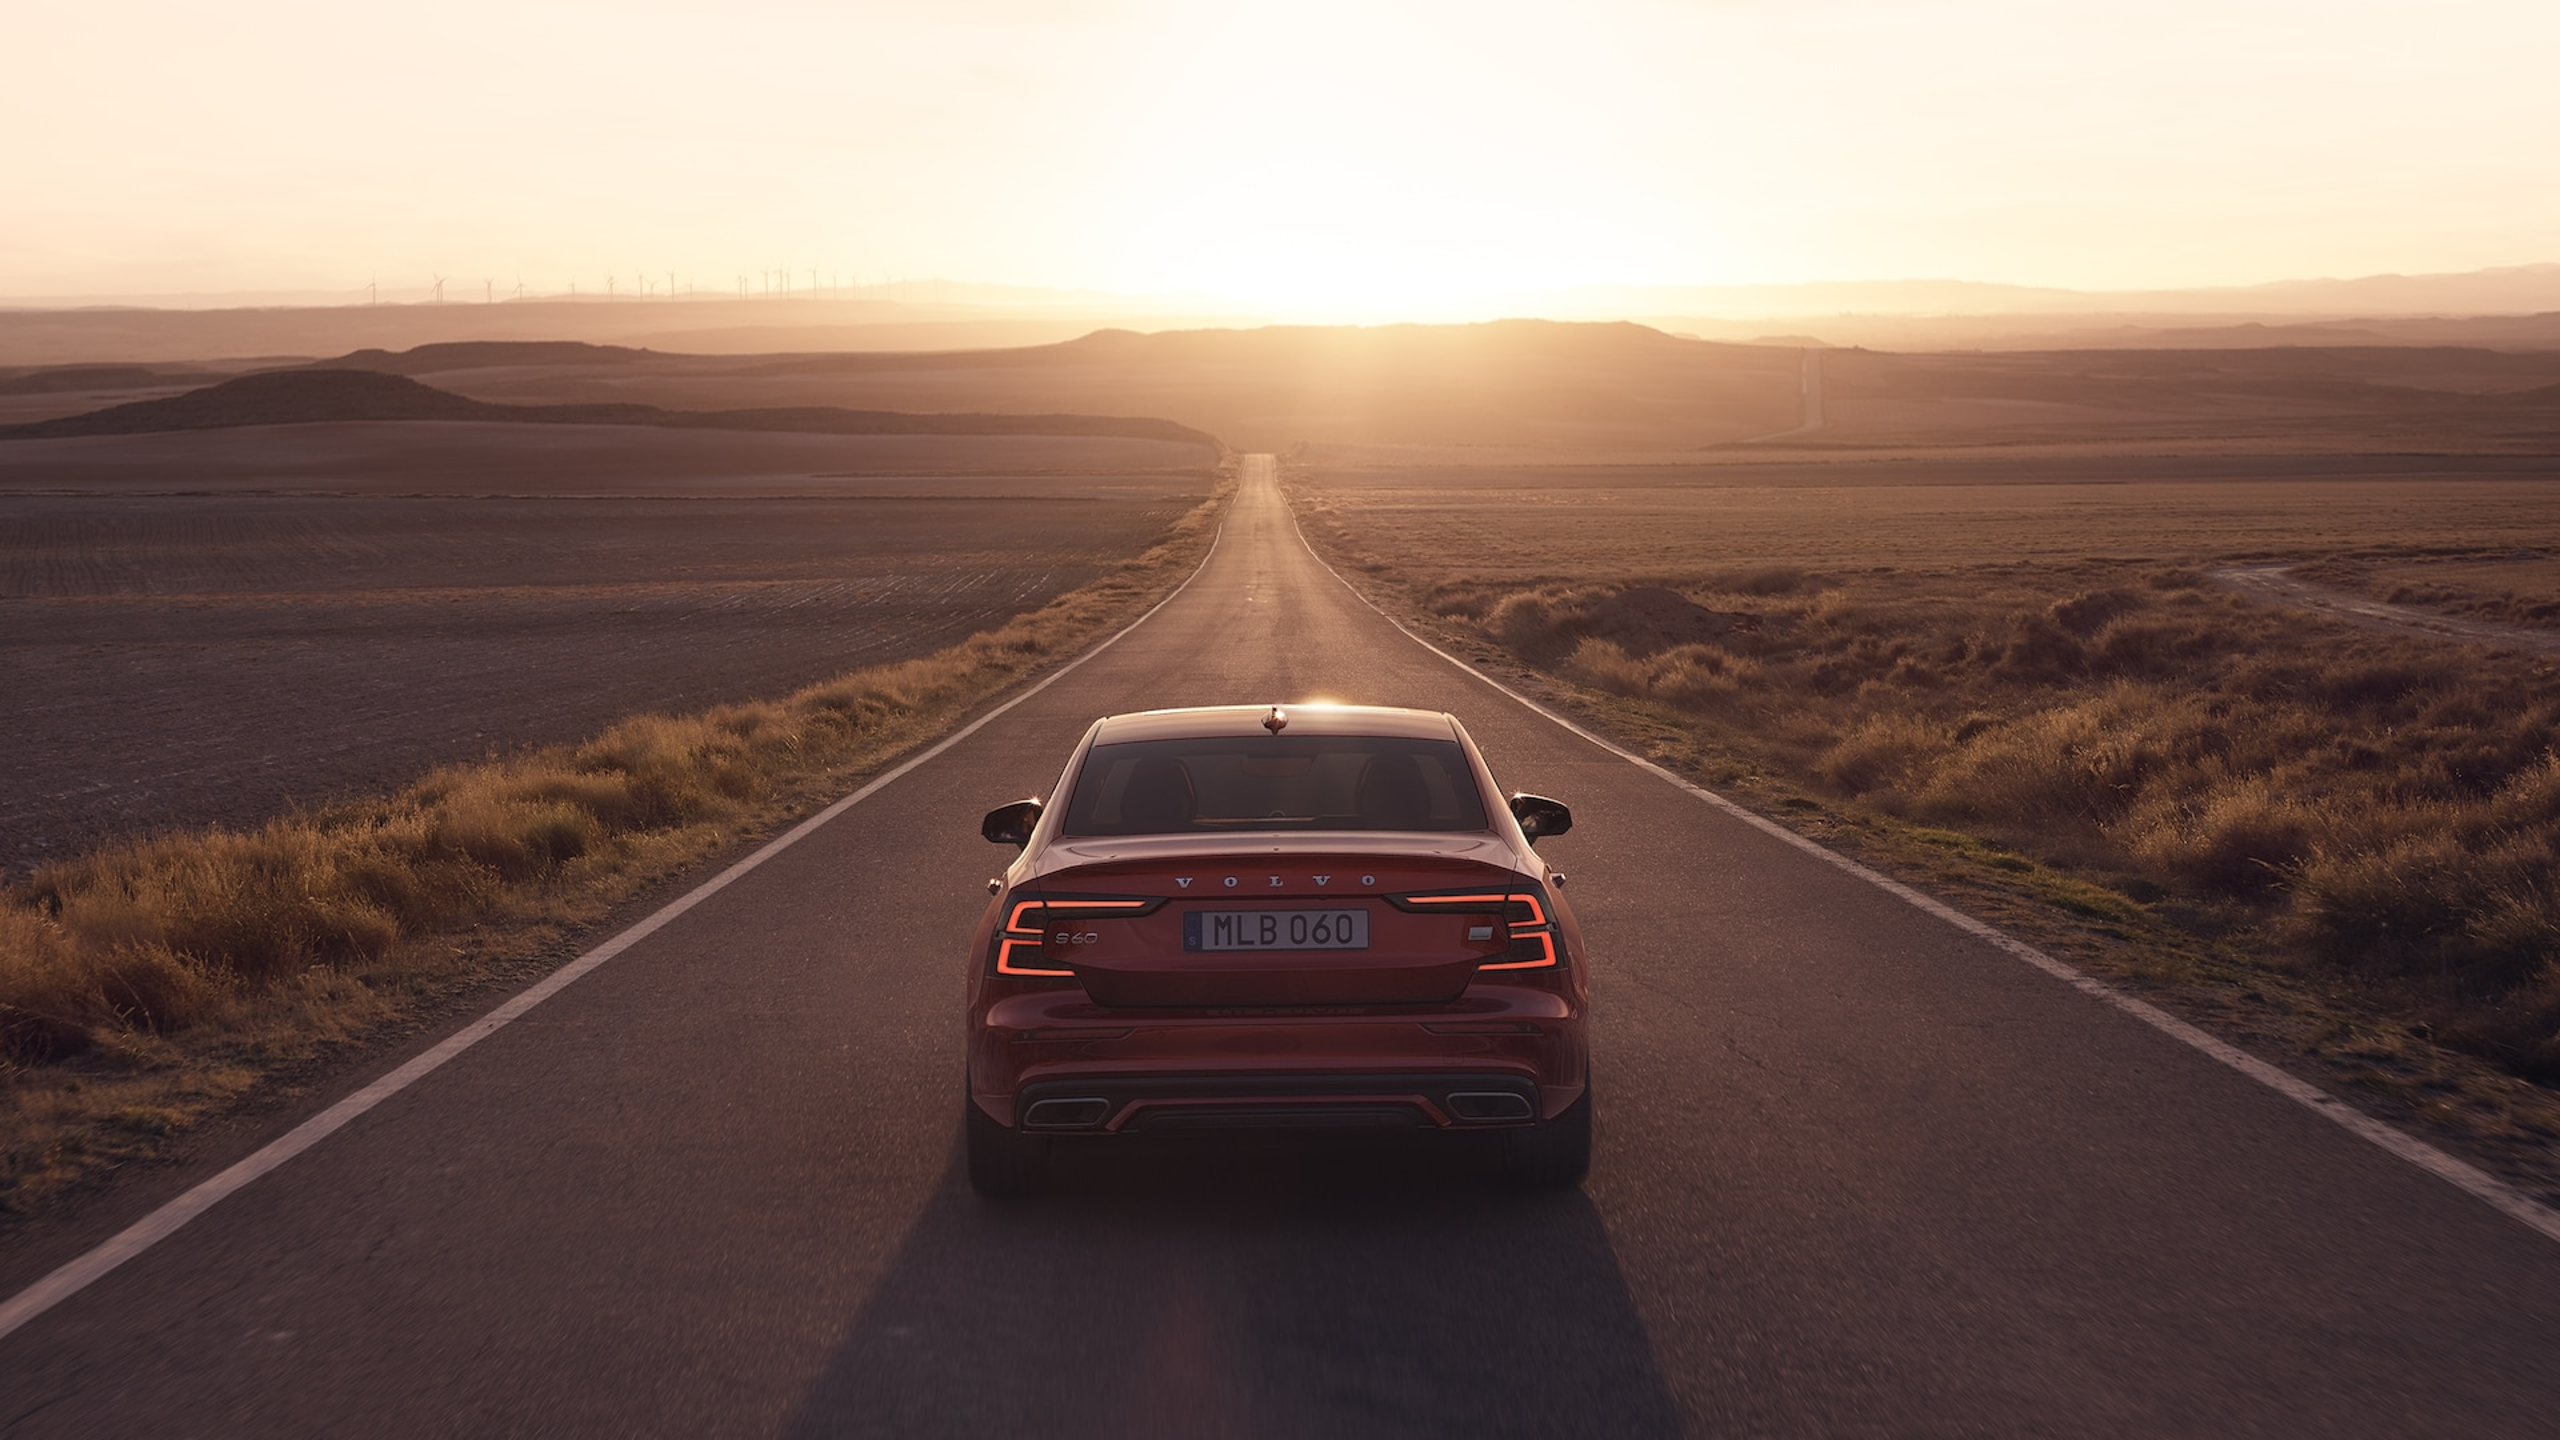 Volvo S60 Recharge สีแดงกำลังวิ่งอยู่บนถนนขณะพระอาทิตย์ตกดิน